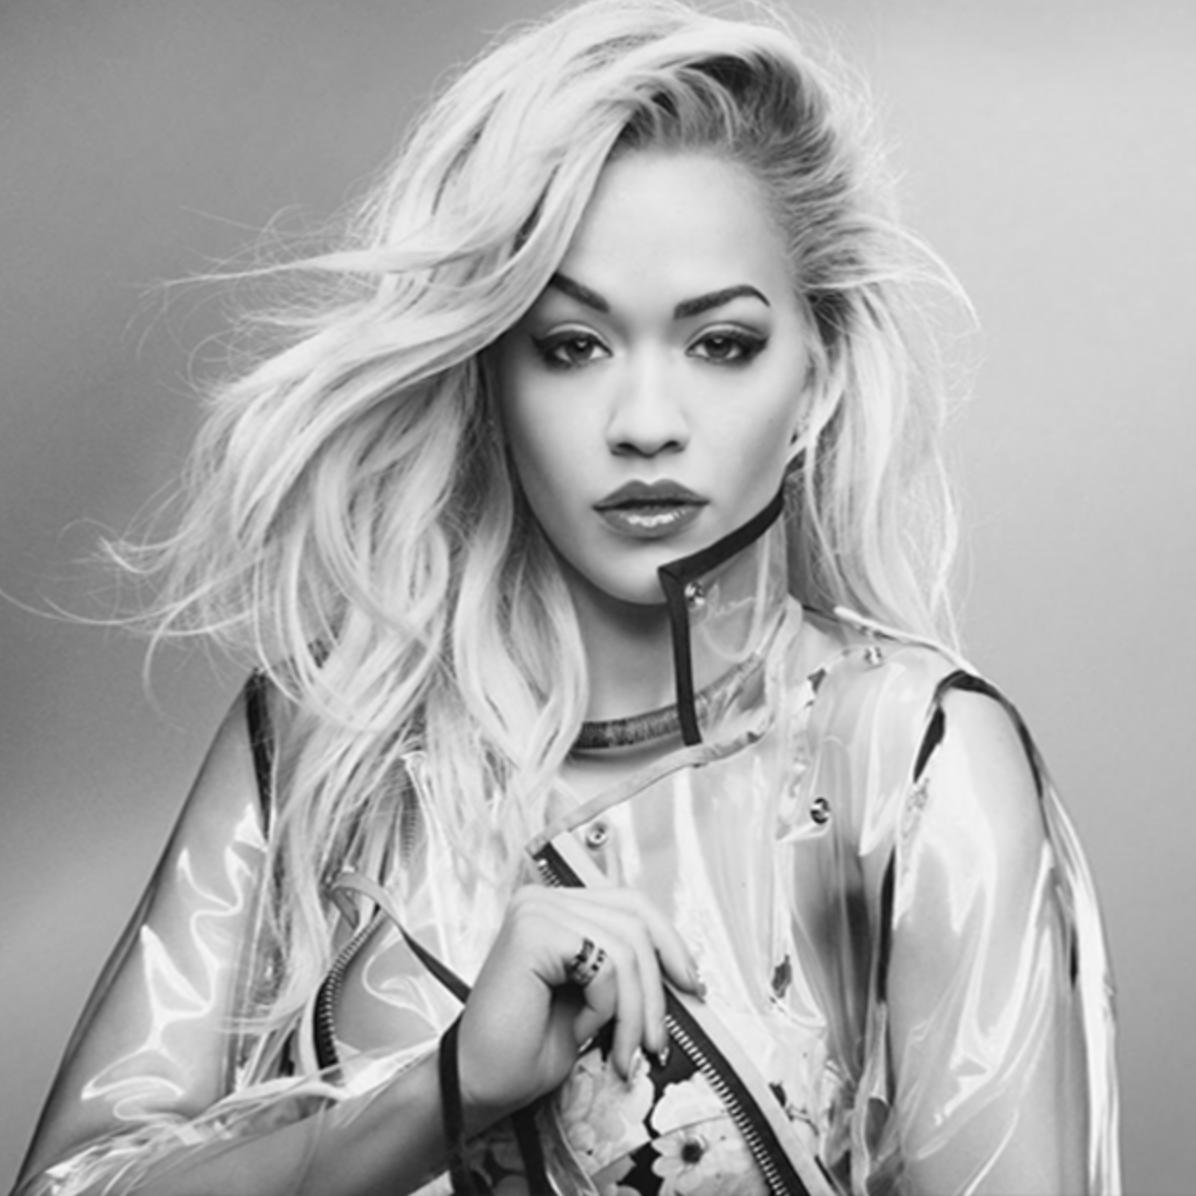 Rita Ora photoshoot